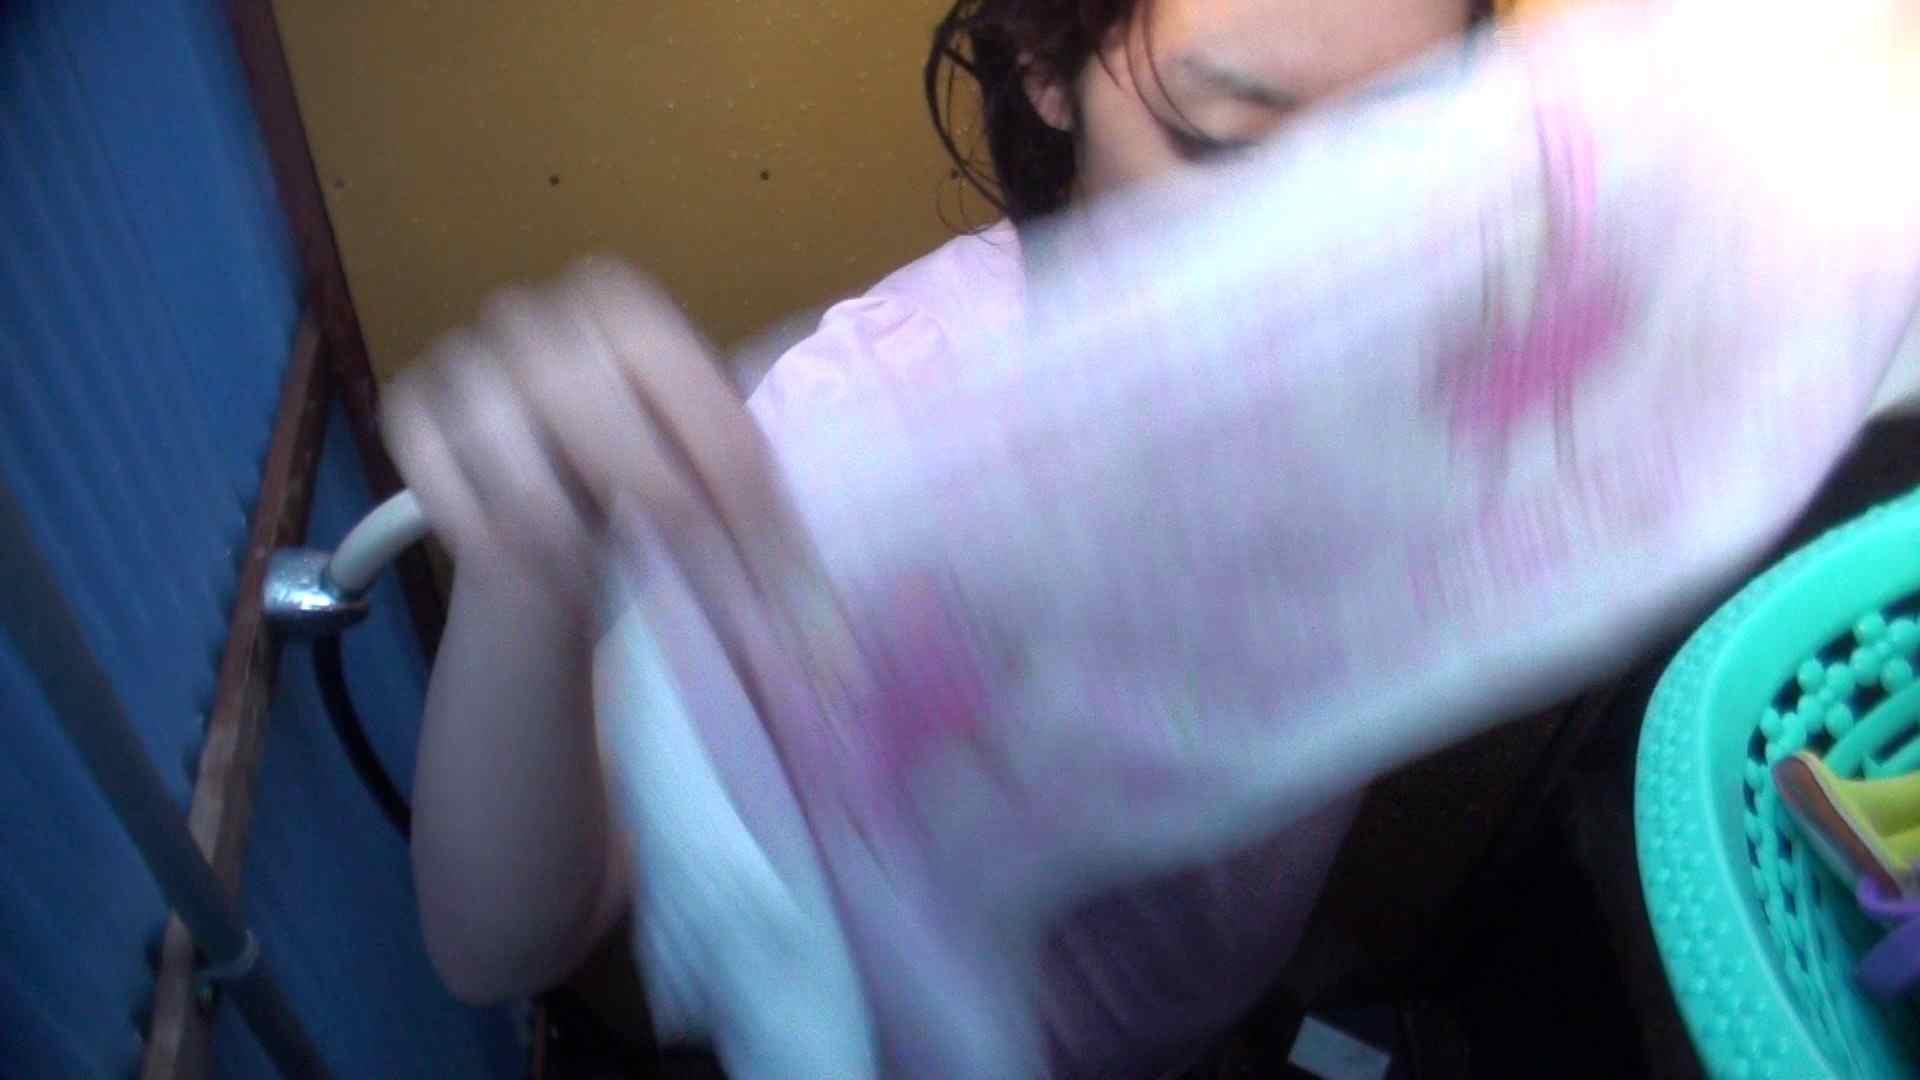 Vol.4 ツインテールとピンクの水着夢見る乙女の貧乳ちゃん シャワー室 濡れ場動画紹介 66画像 12